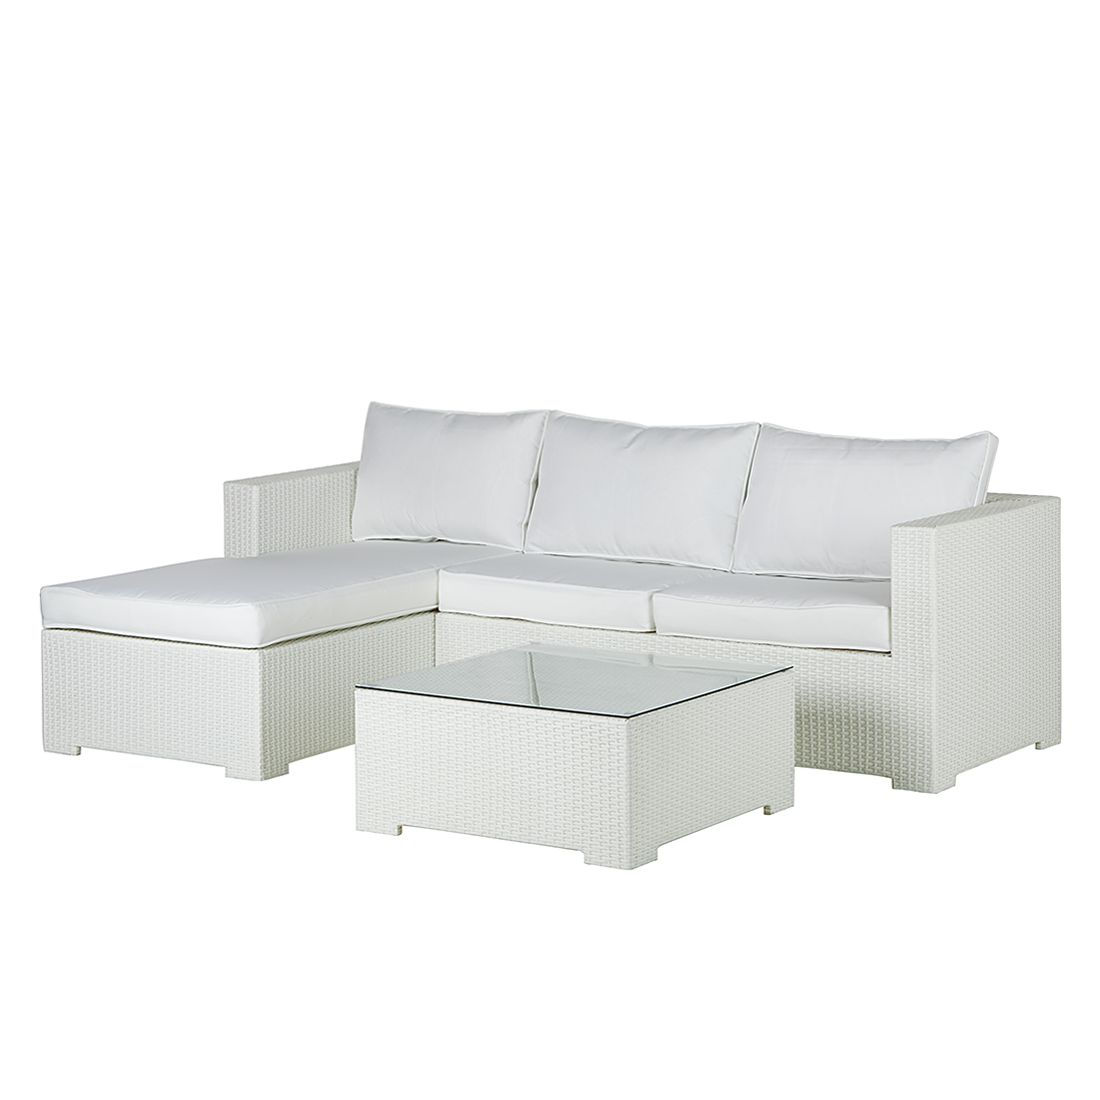 Salon de jardin Paradise Lounge (3 éléments) - Poly rotin / Textile - Blanc, Fredriks